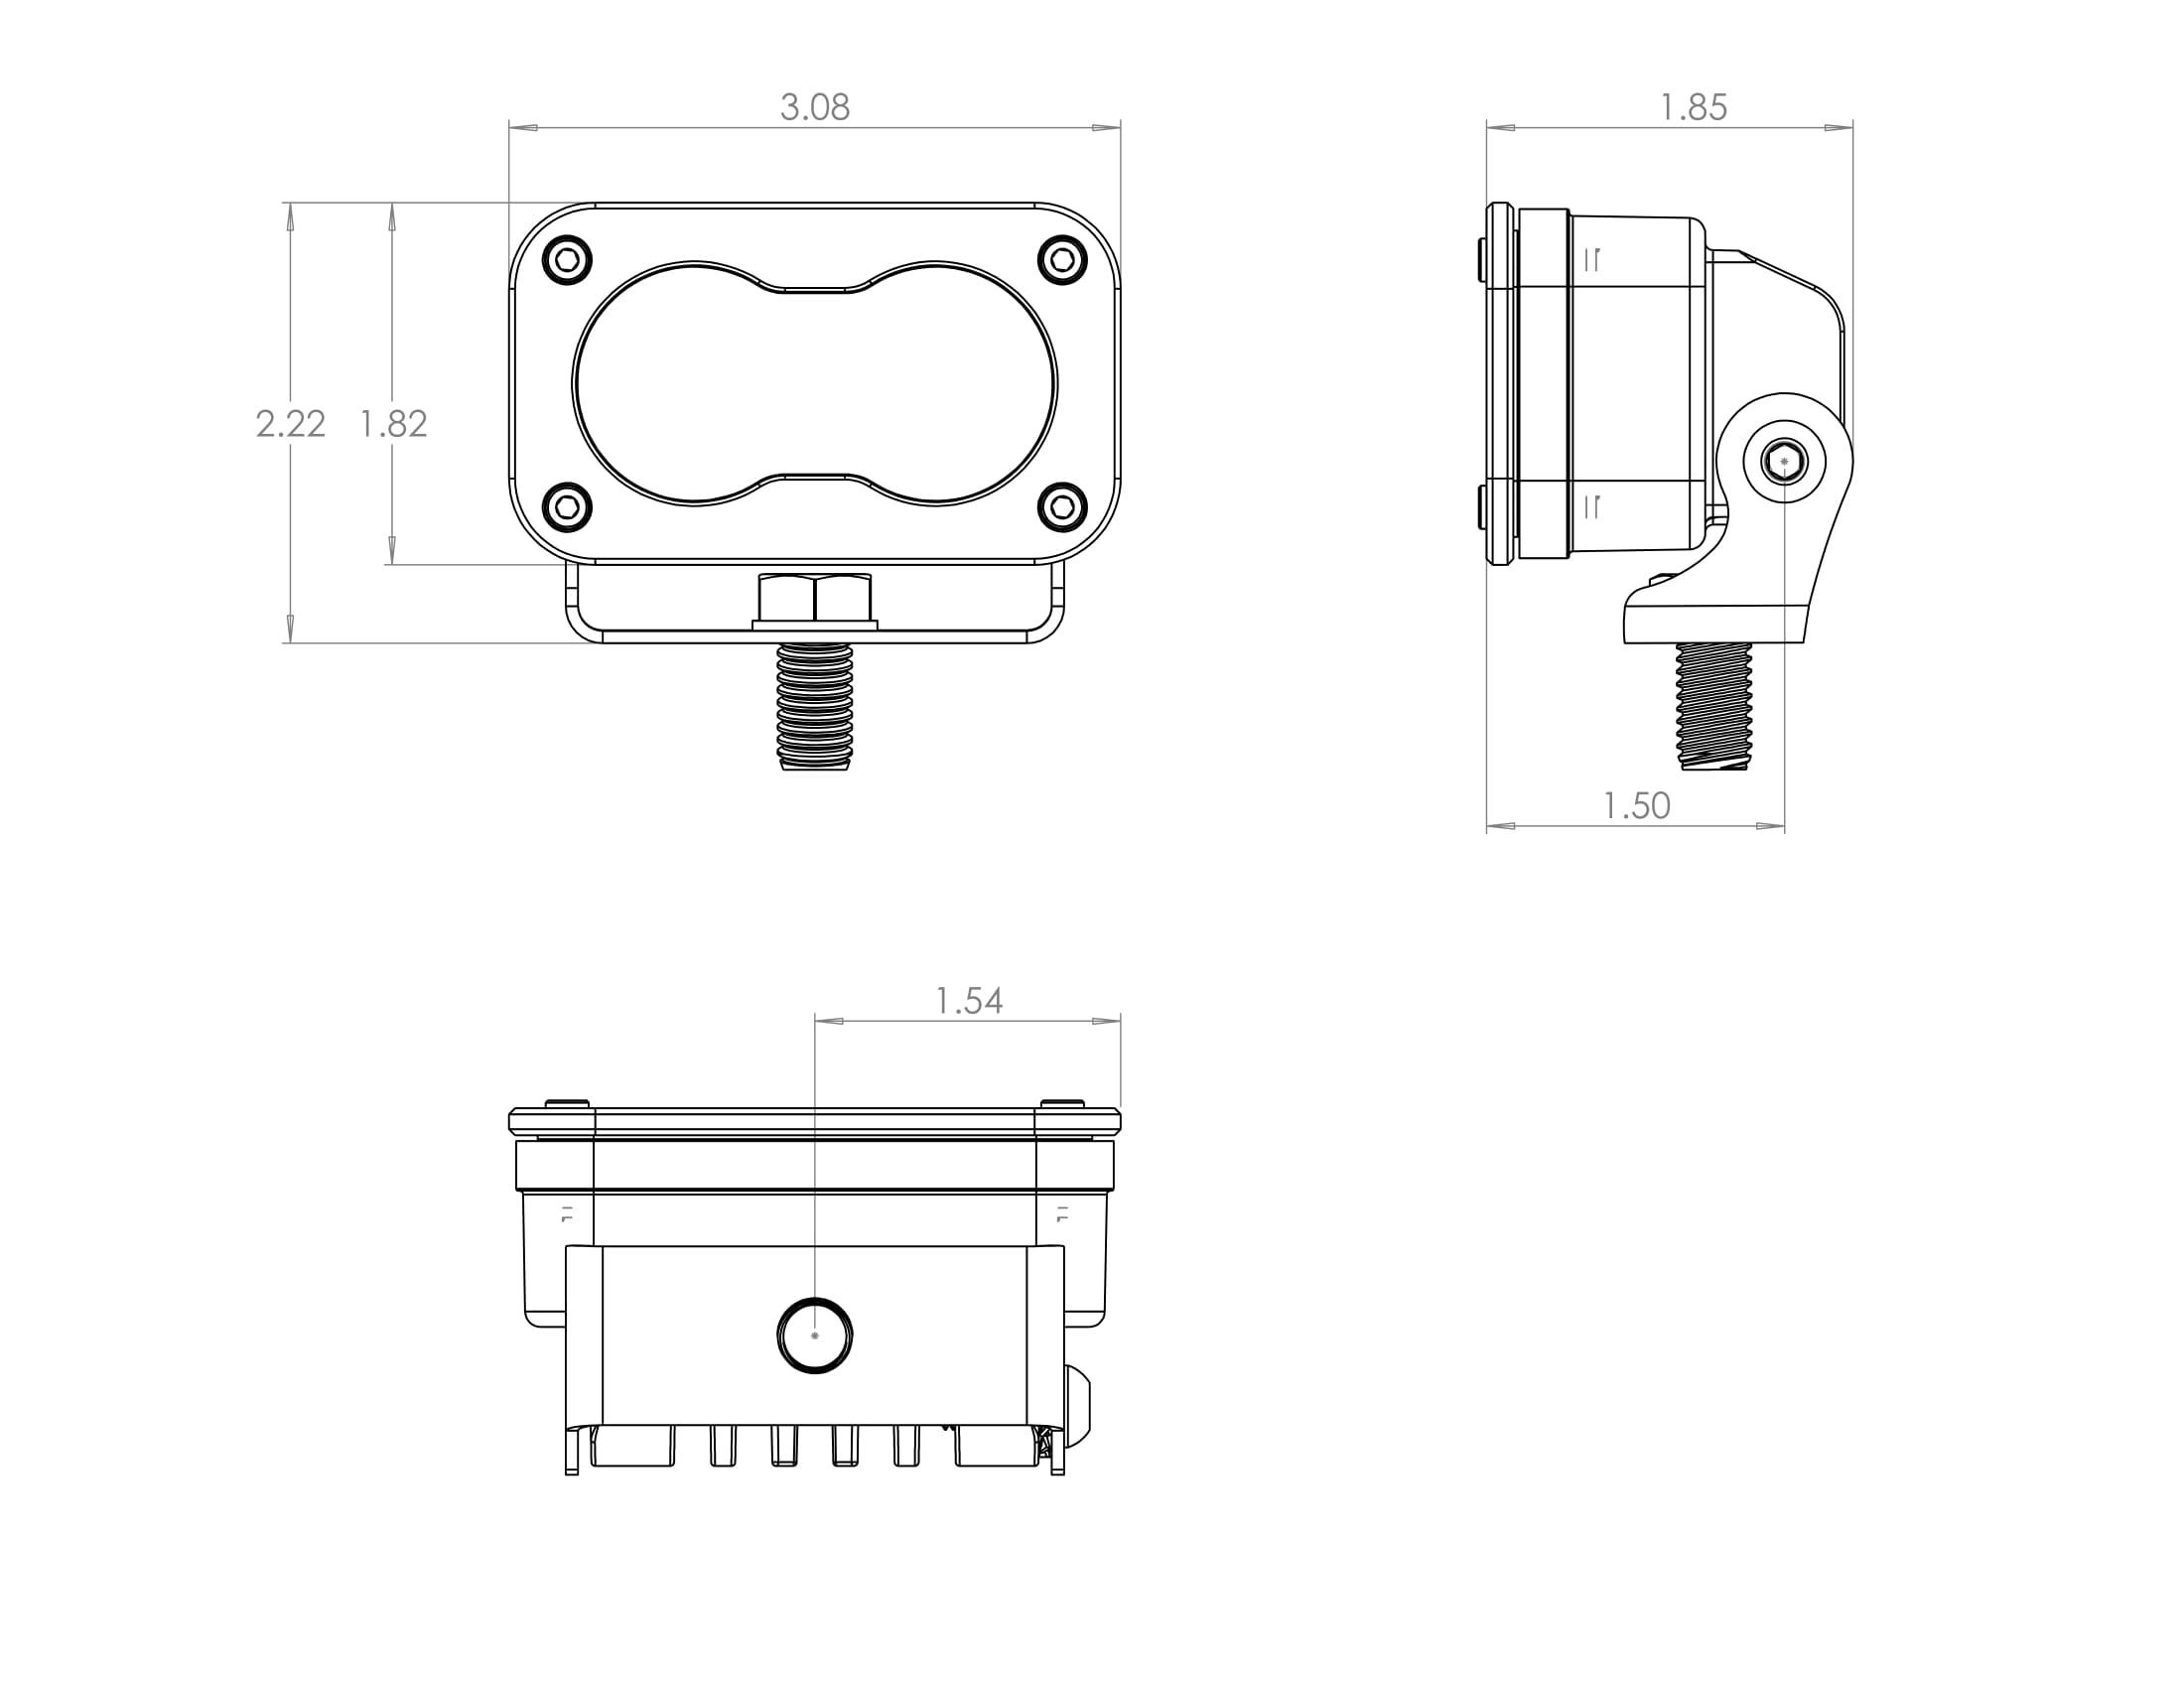 baja designs  u2013 s2 pro led light  u2013 colored lenses  u00bb bad